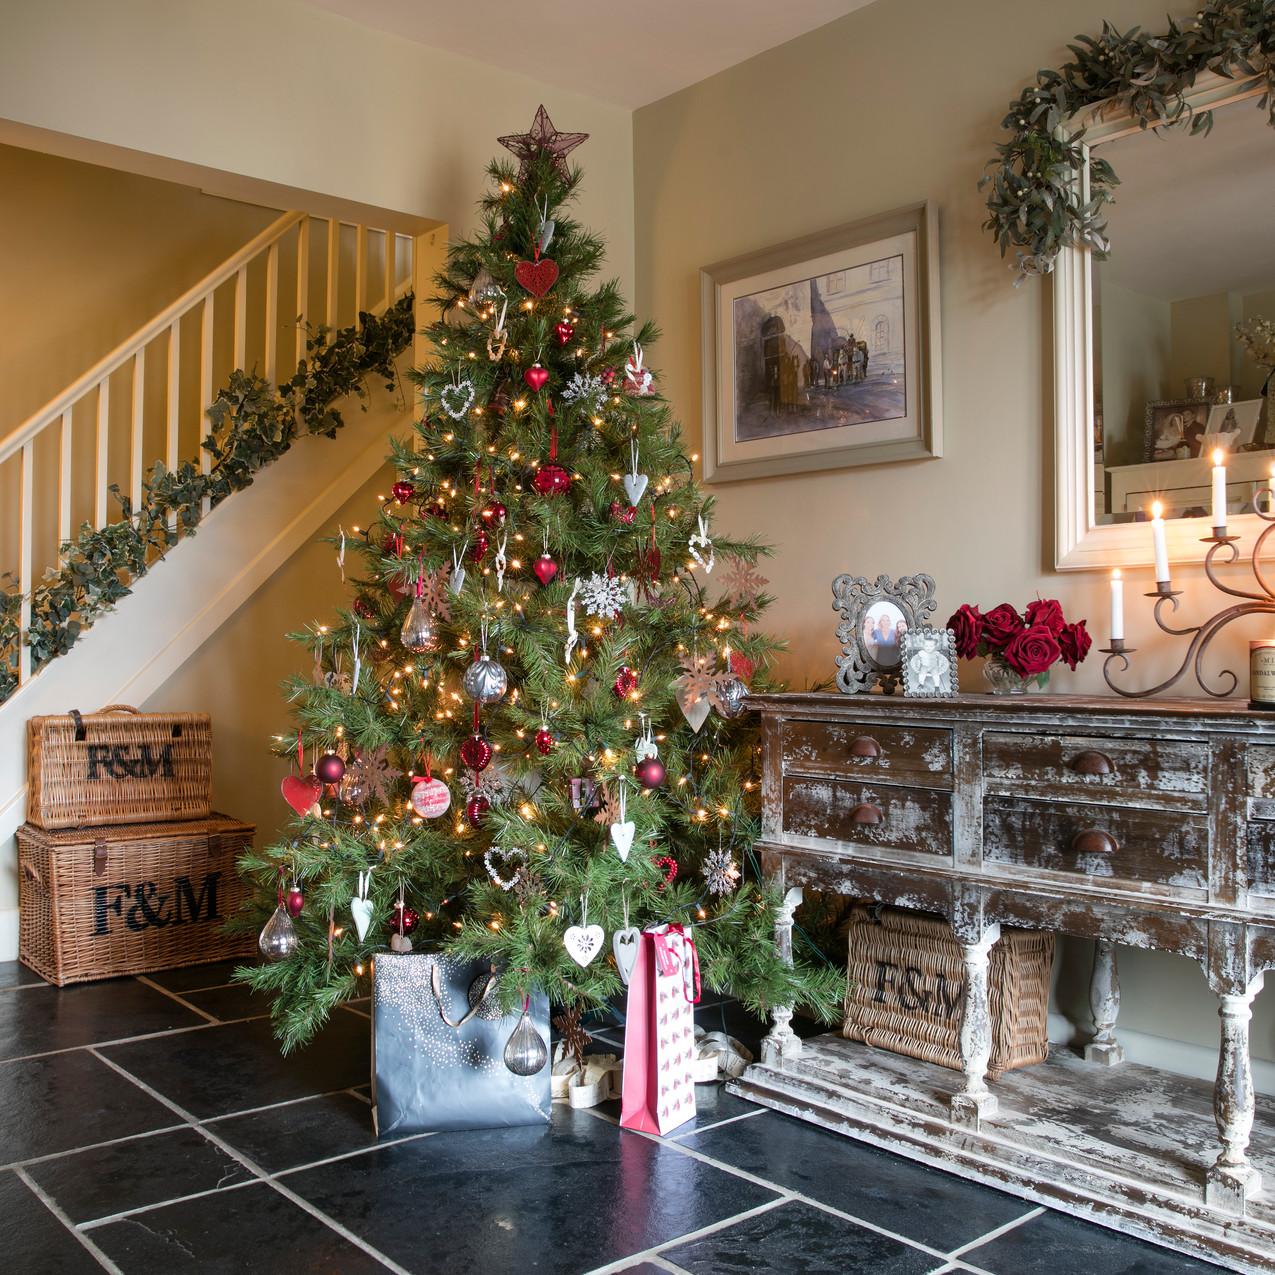 Hall at christmas interior design